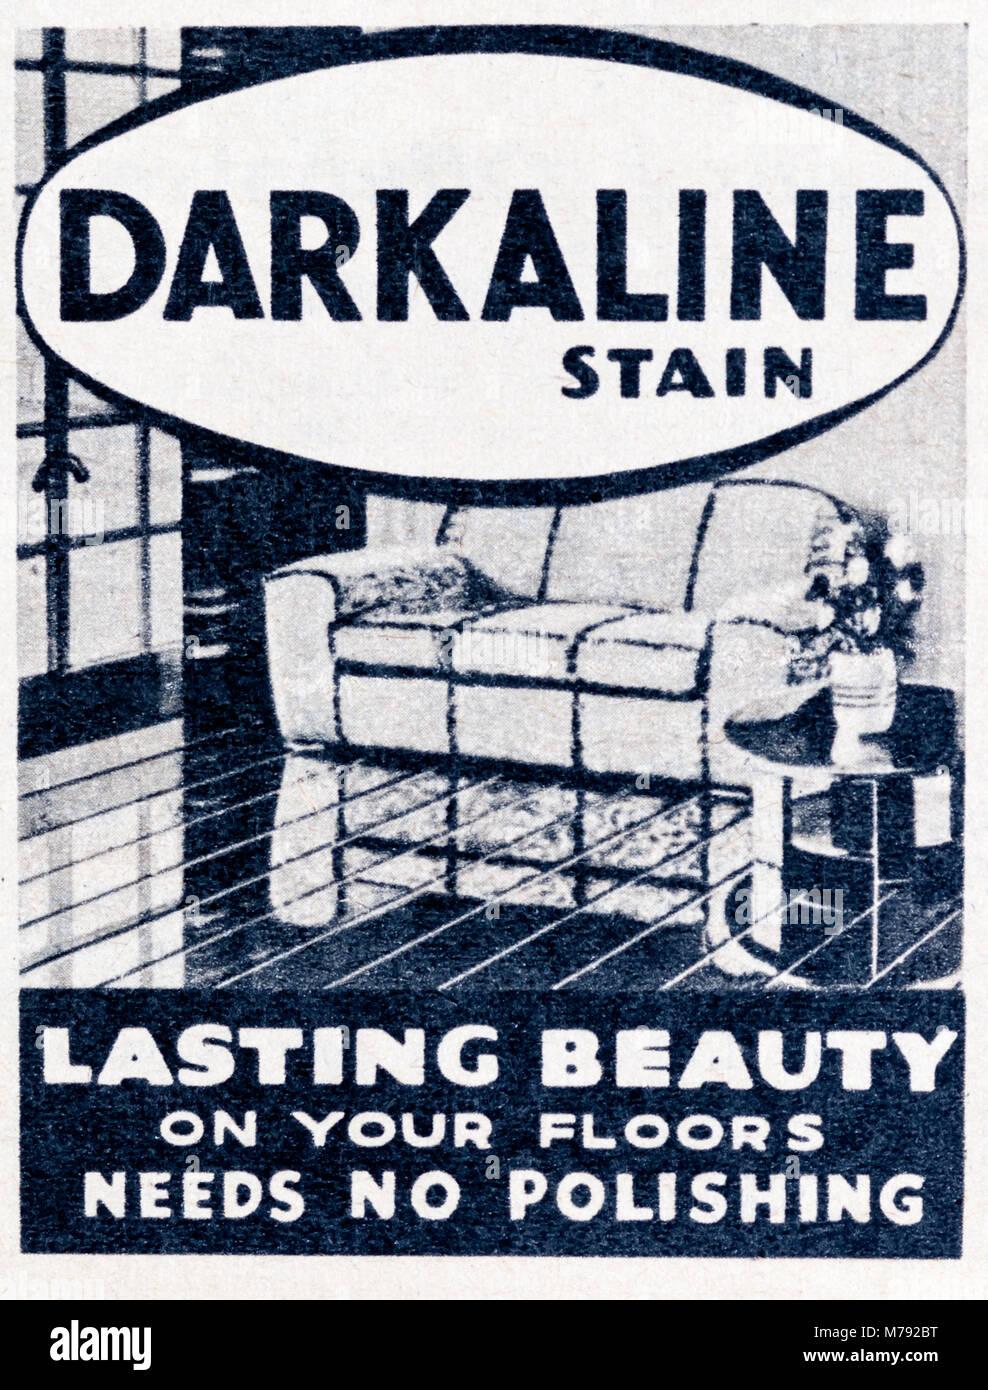 A 1950s magazine advertisement advertising Darkaline floor stain. - Stock Image